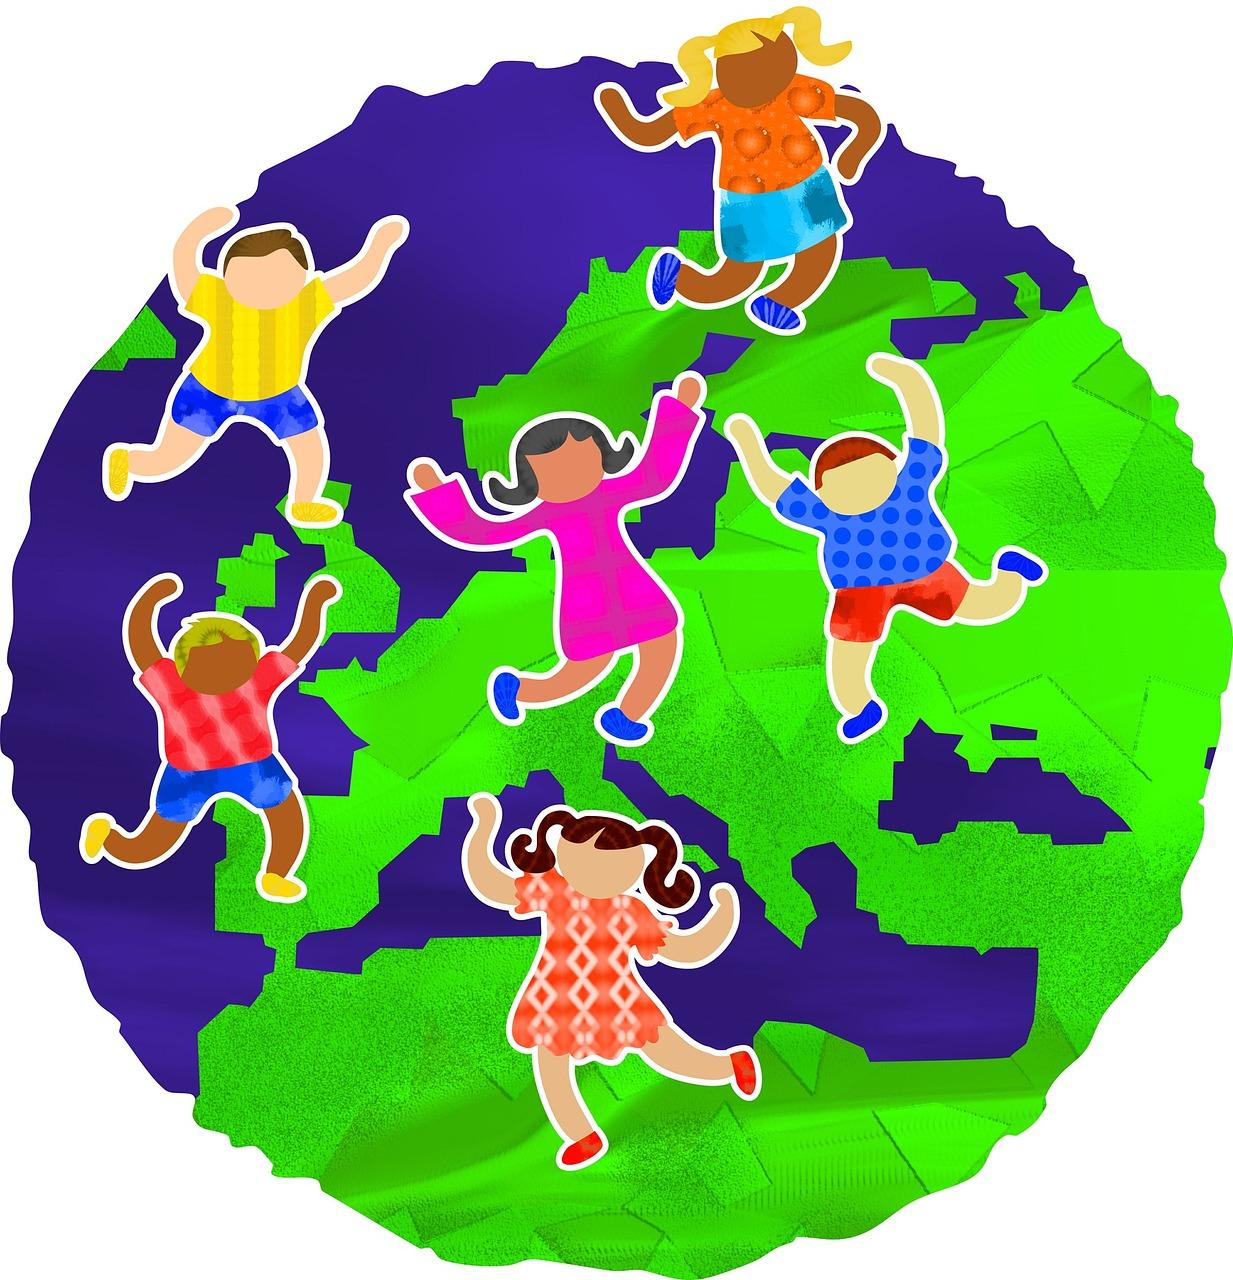 Barn i Europa